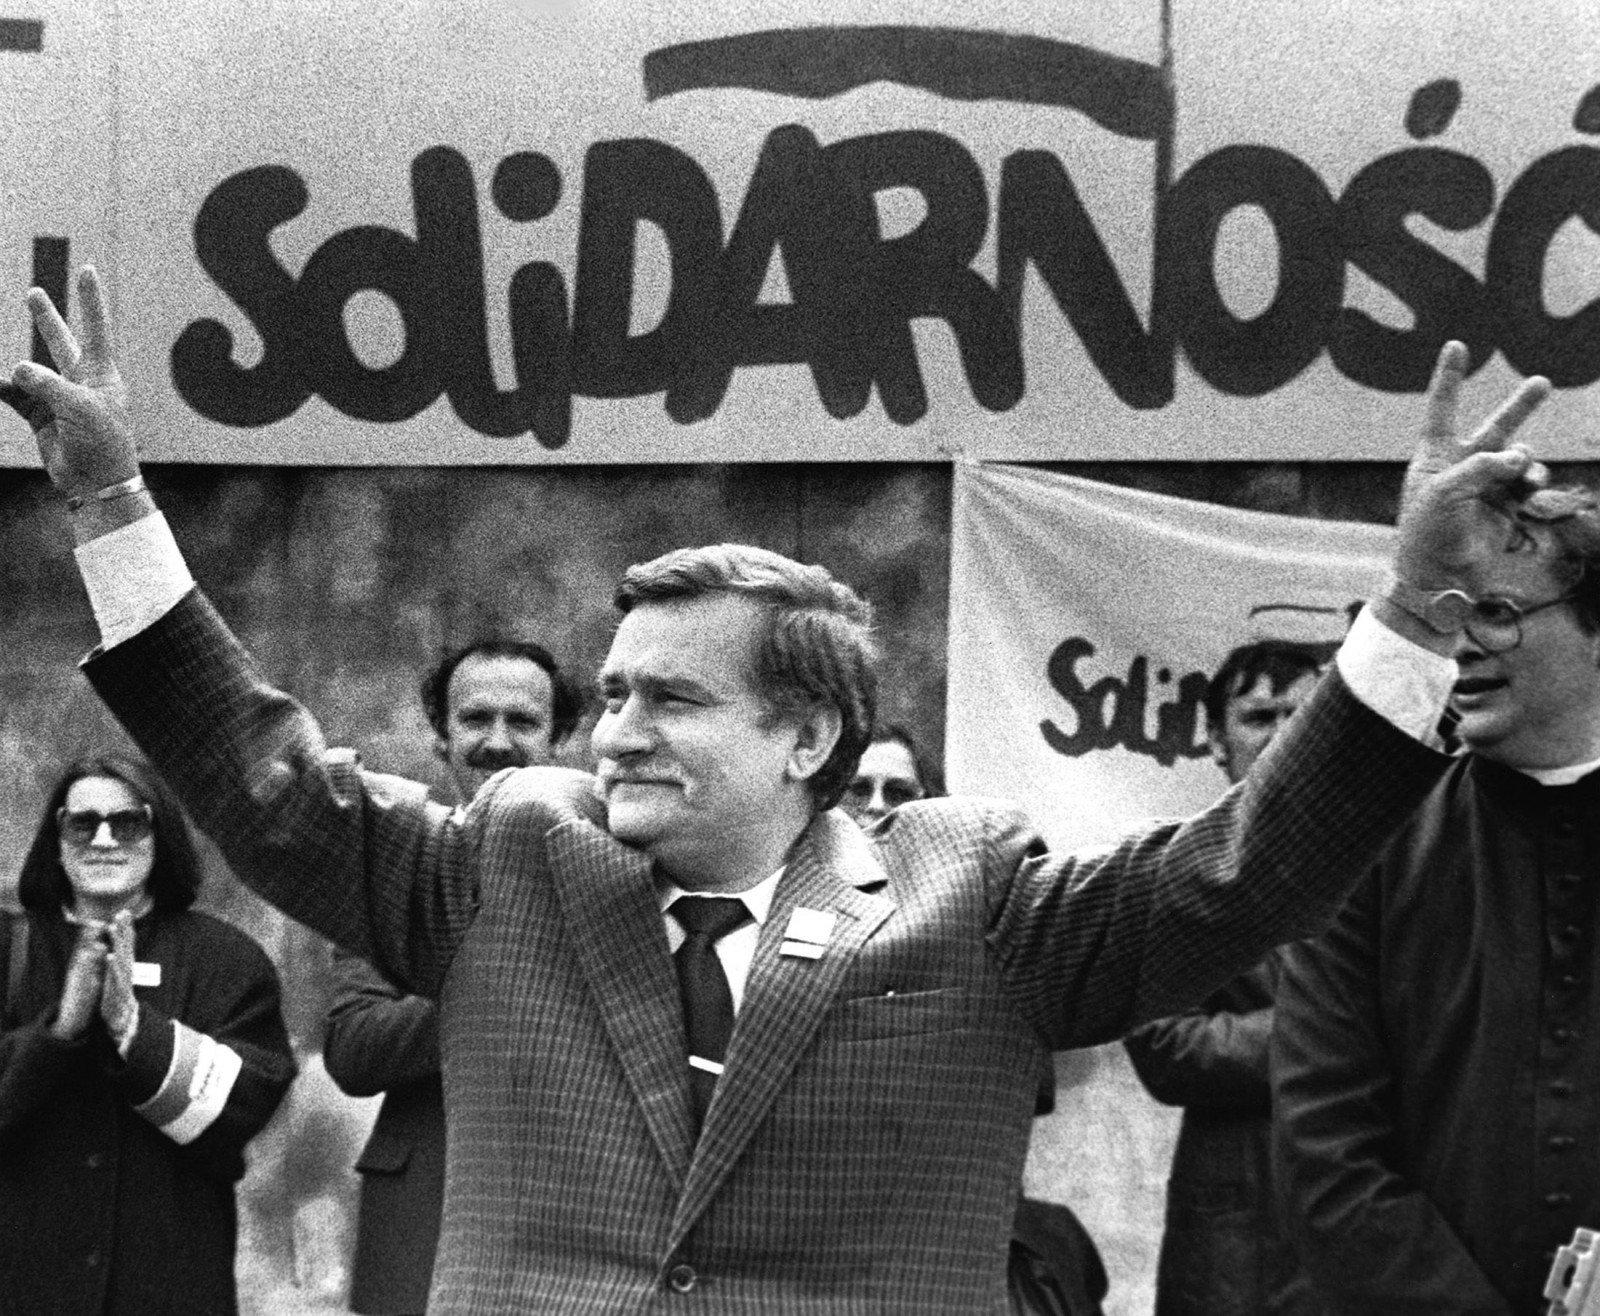 Solidarity (Polish trade union)